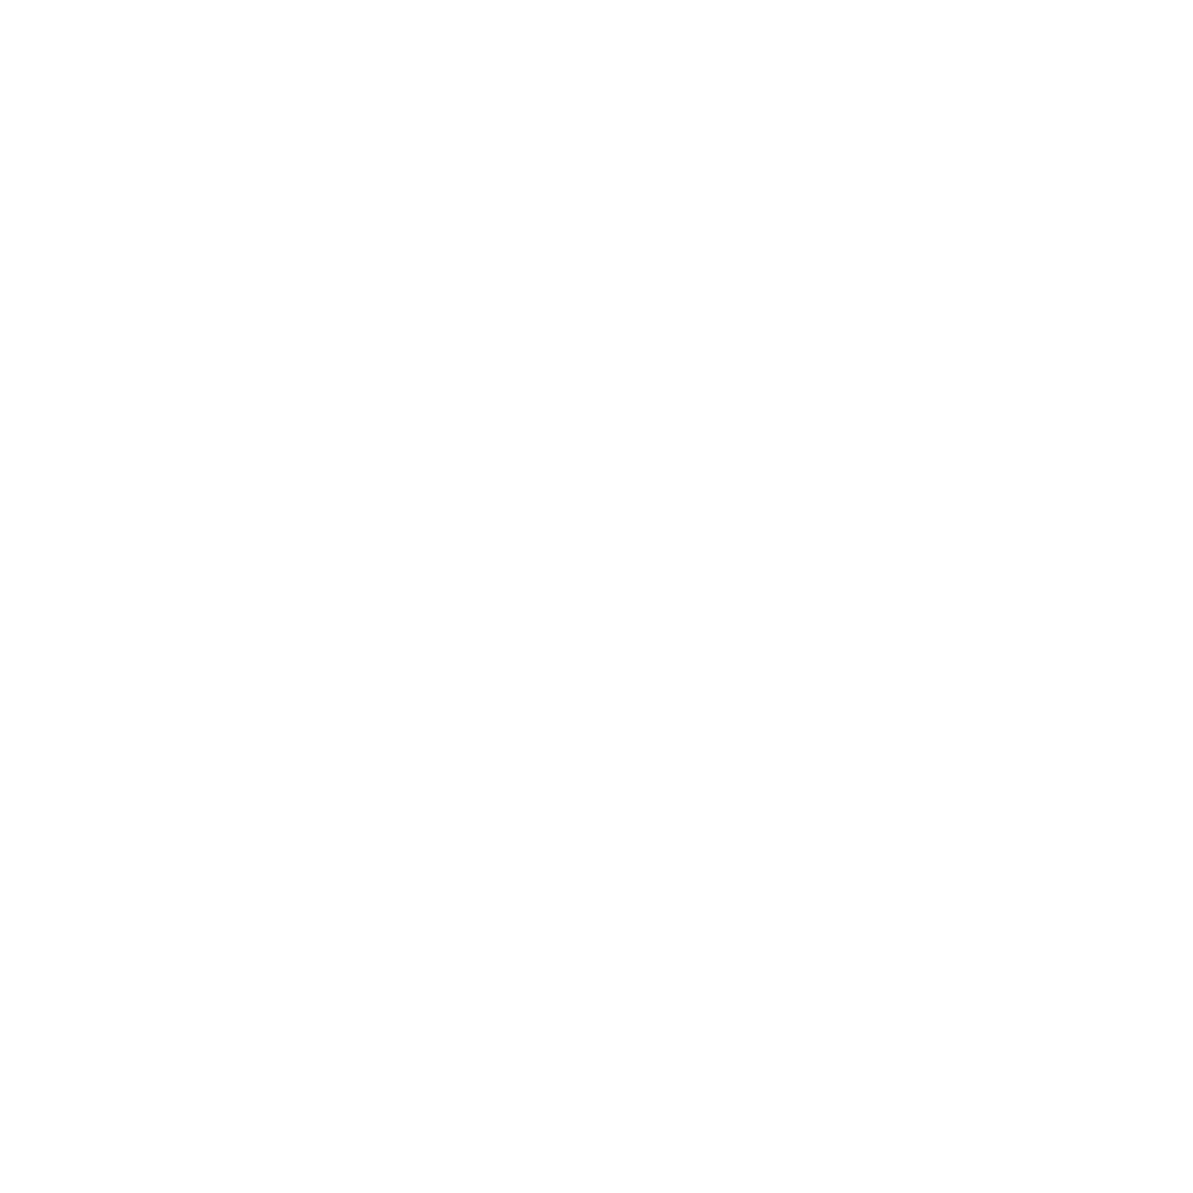 Dutch Ink Albums